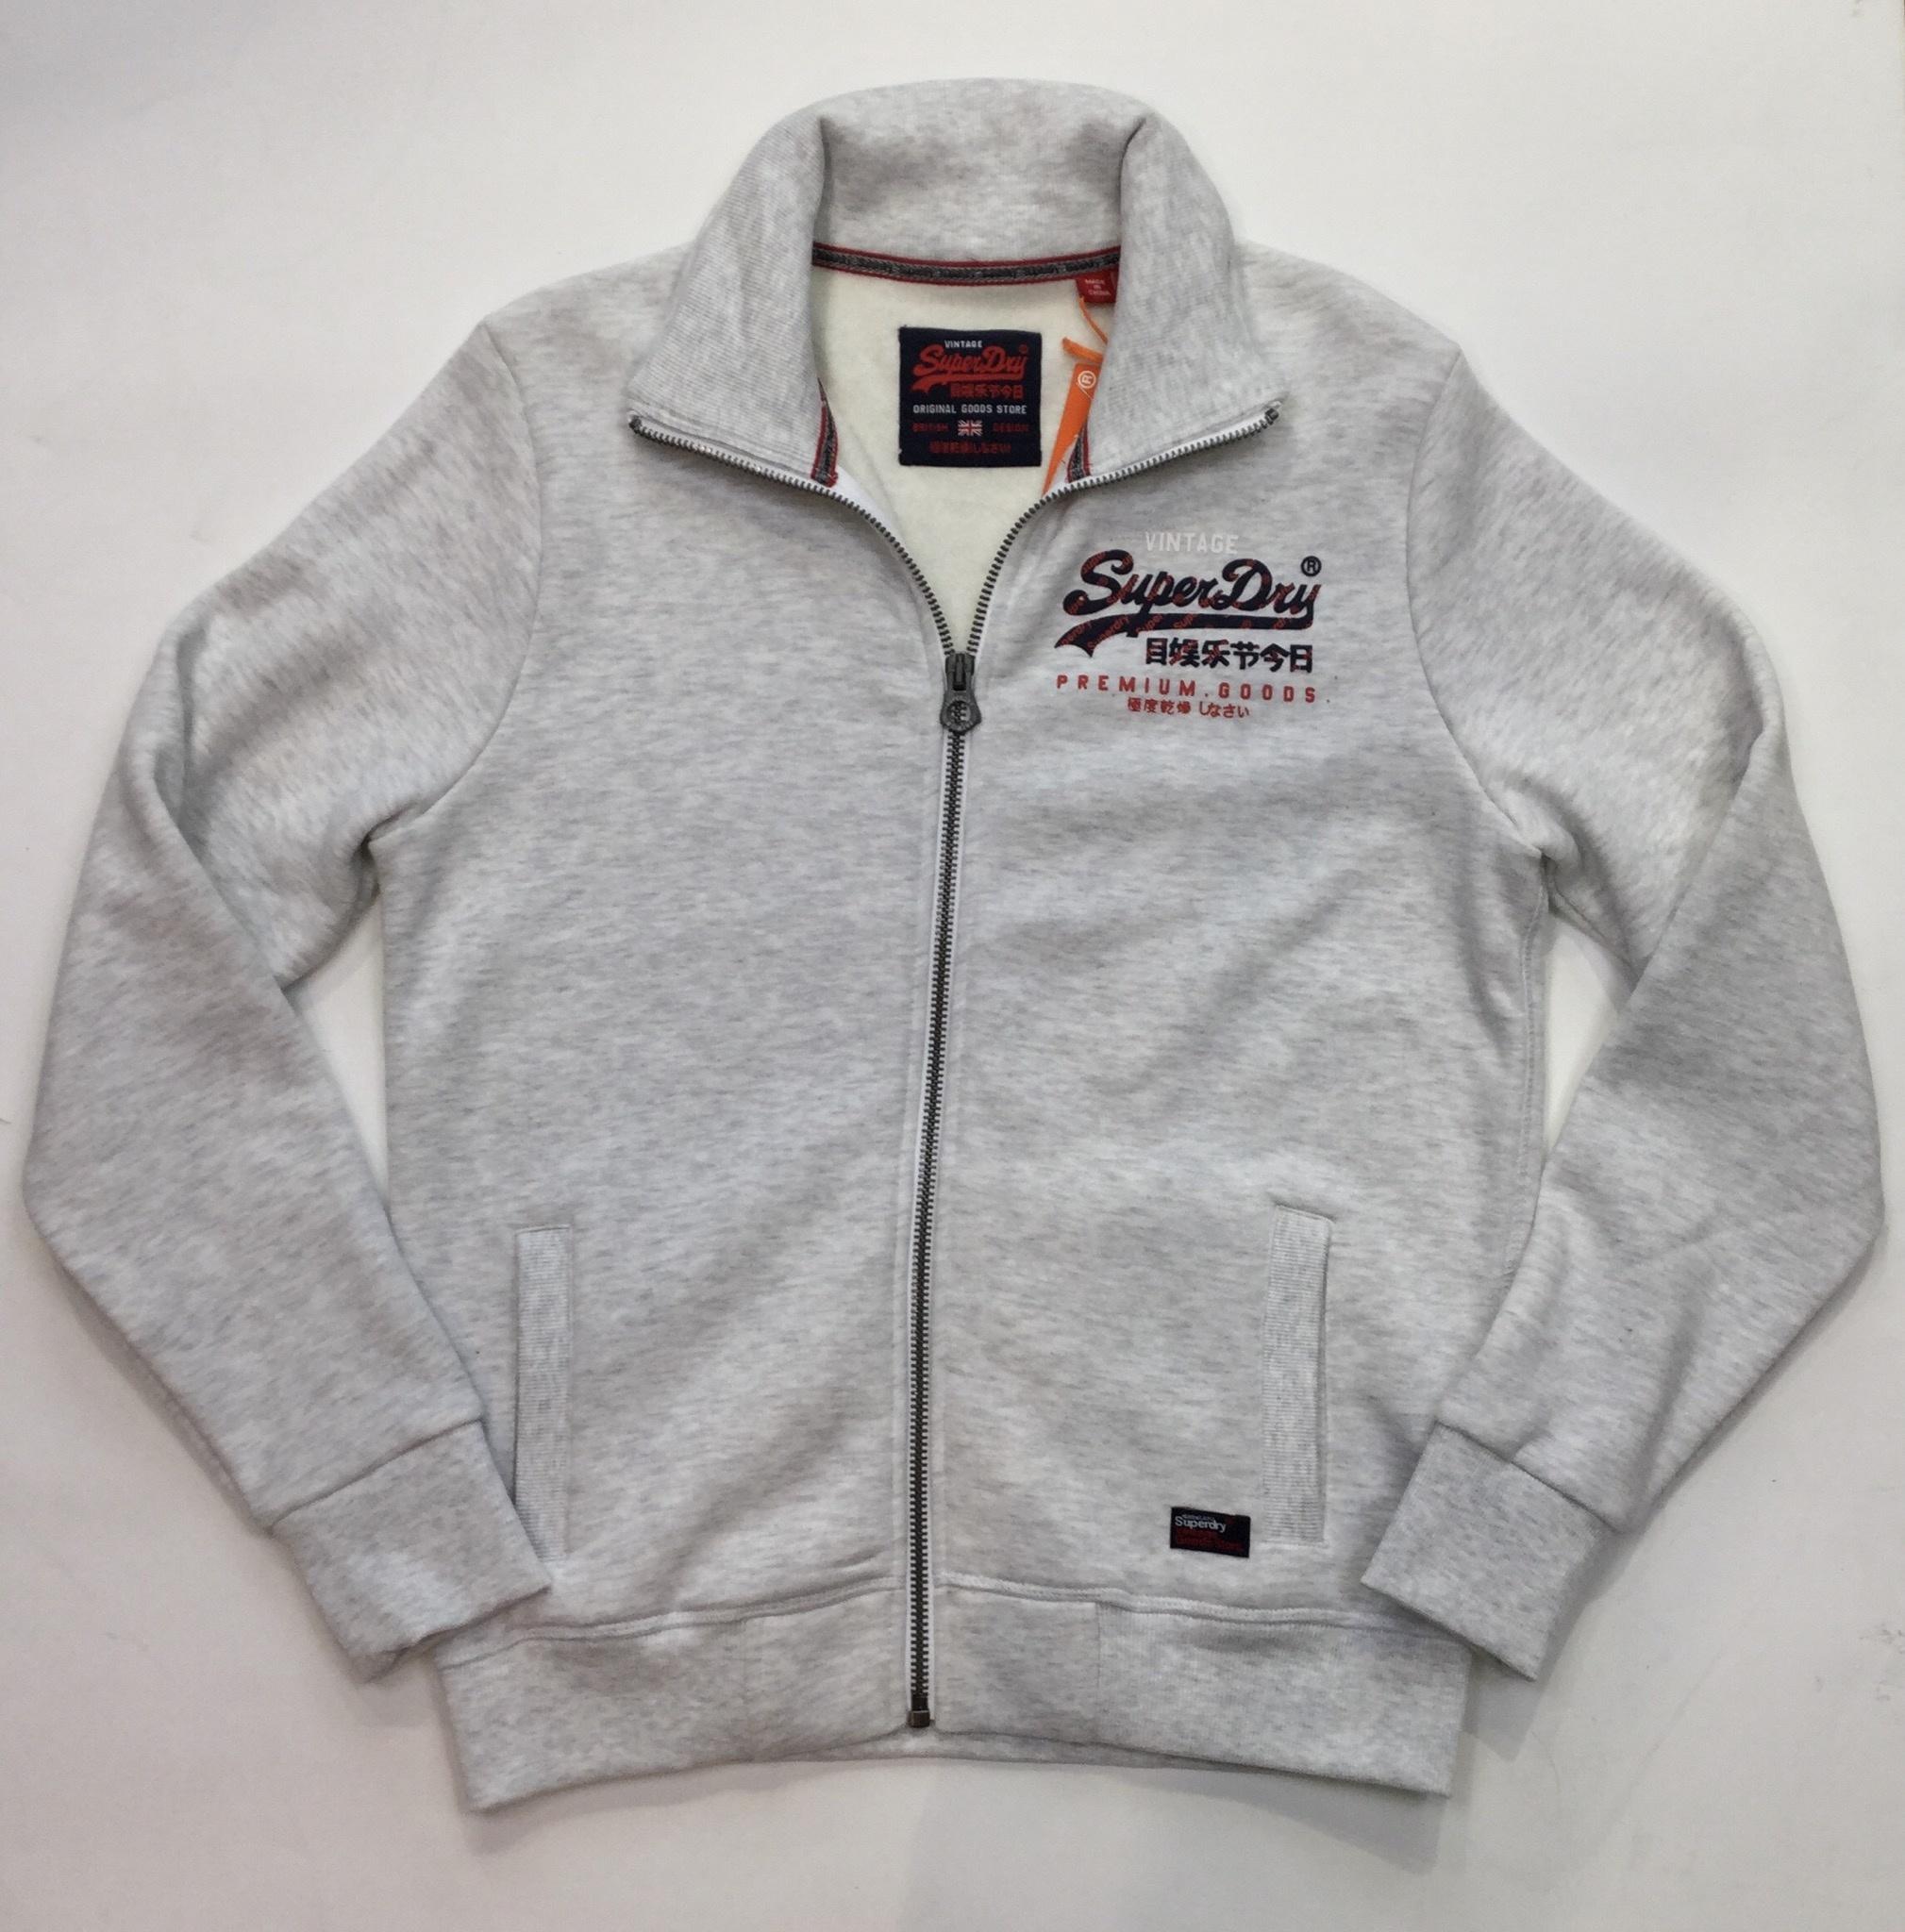 superdry Track zip sweater